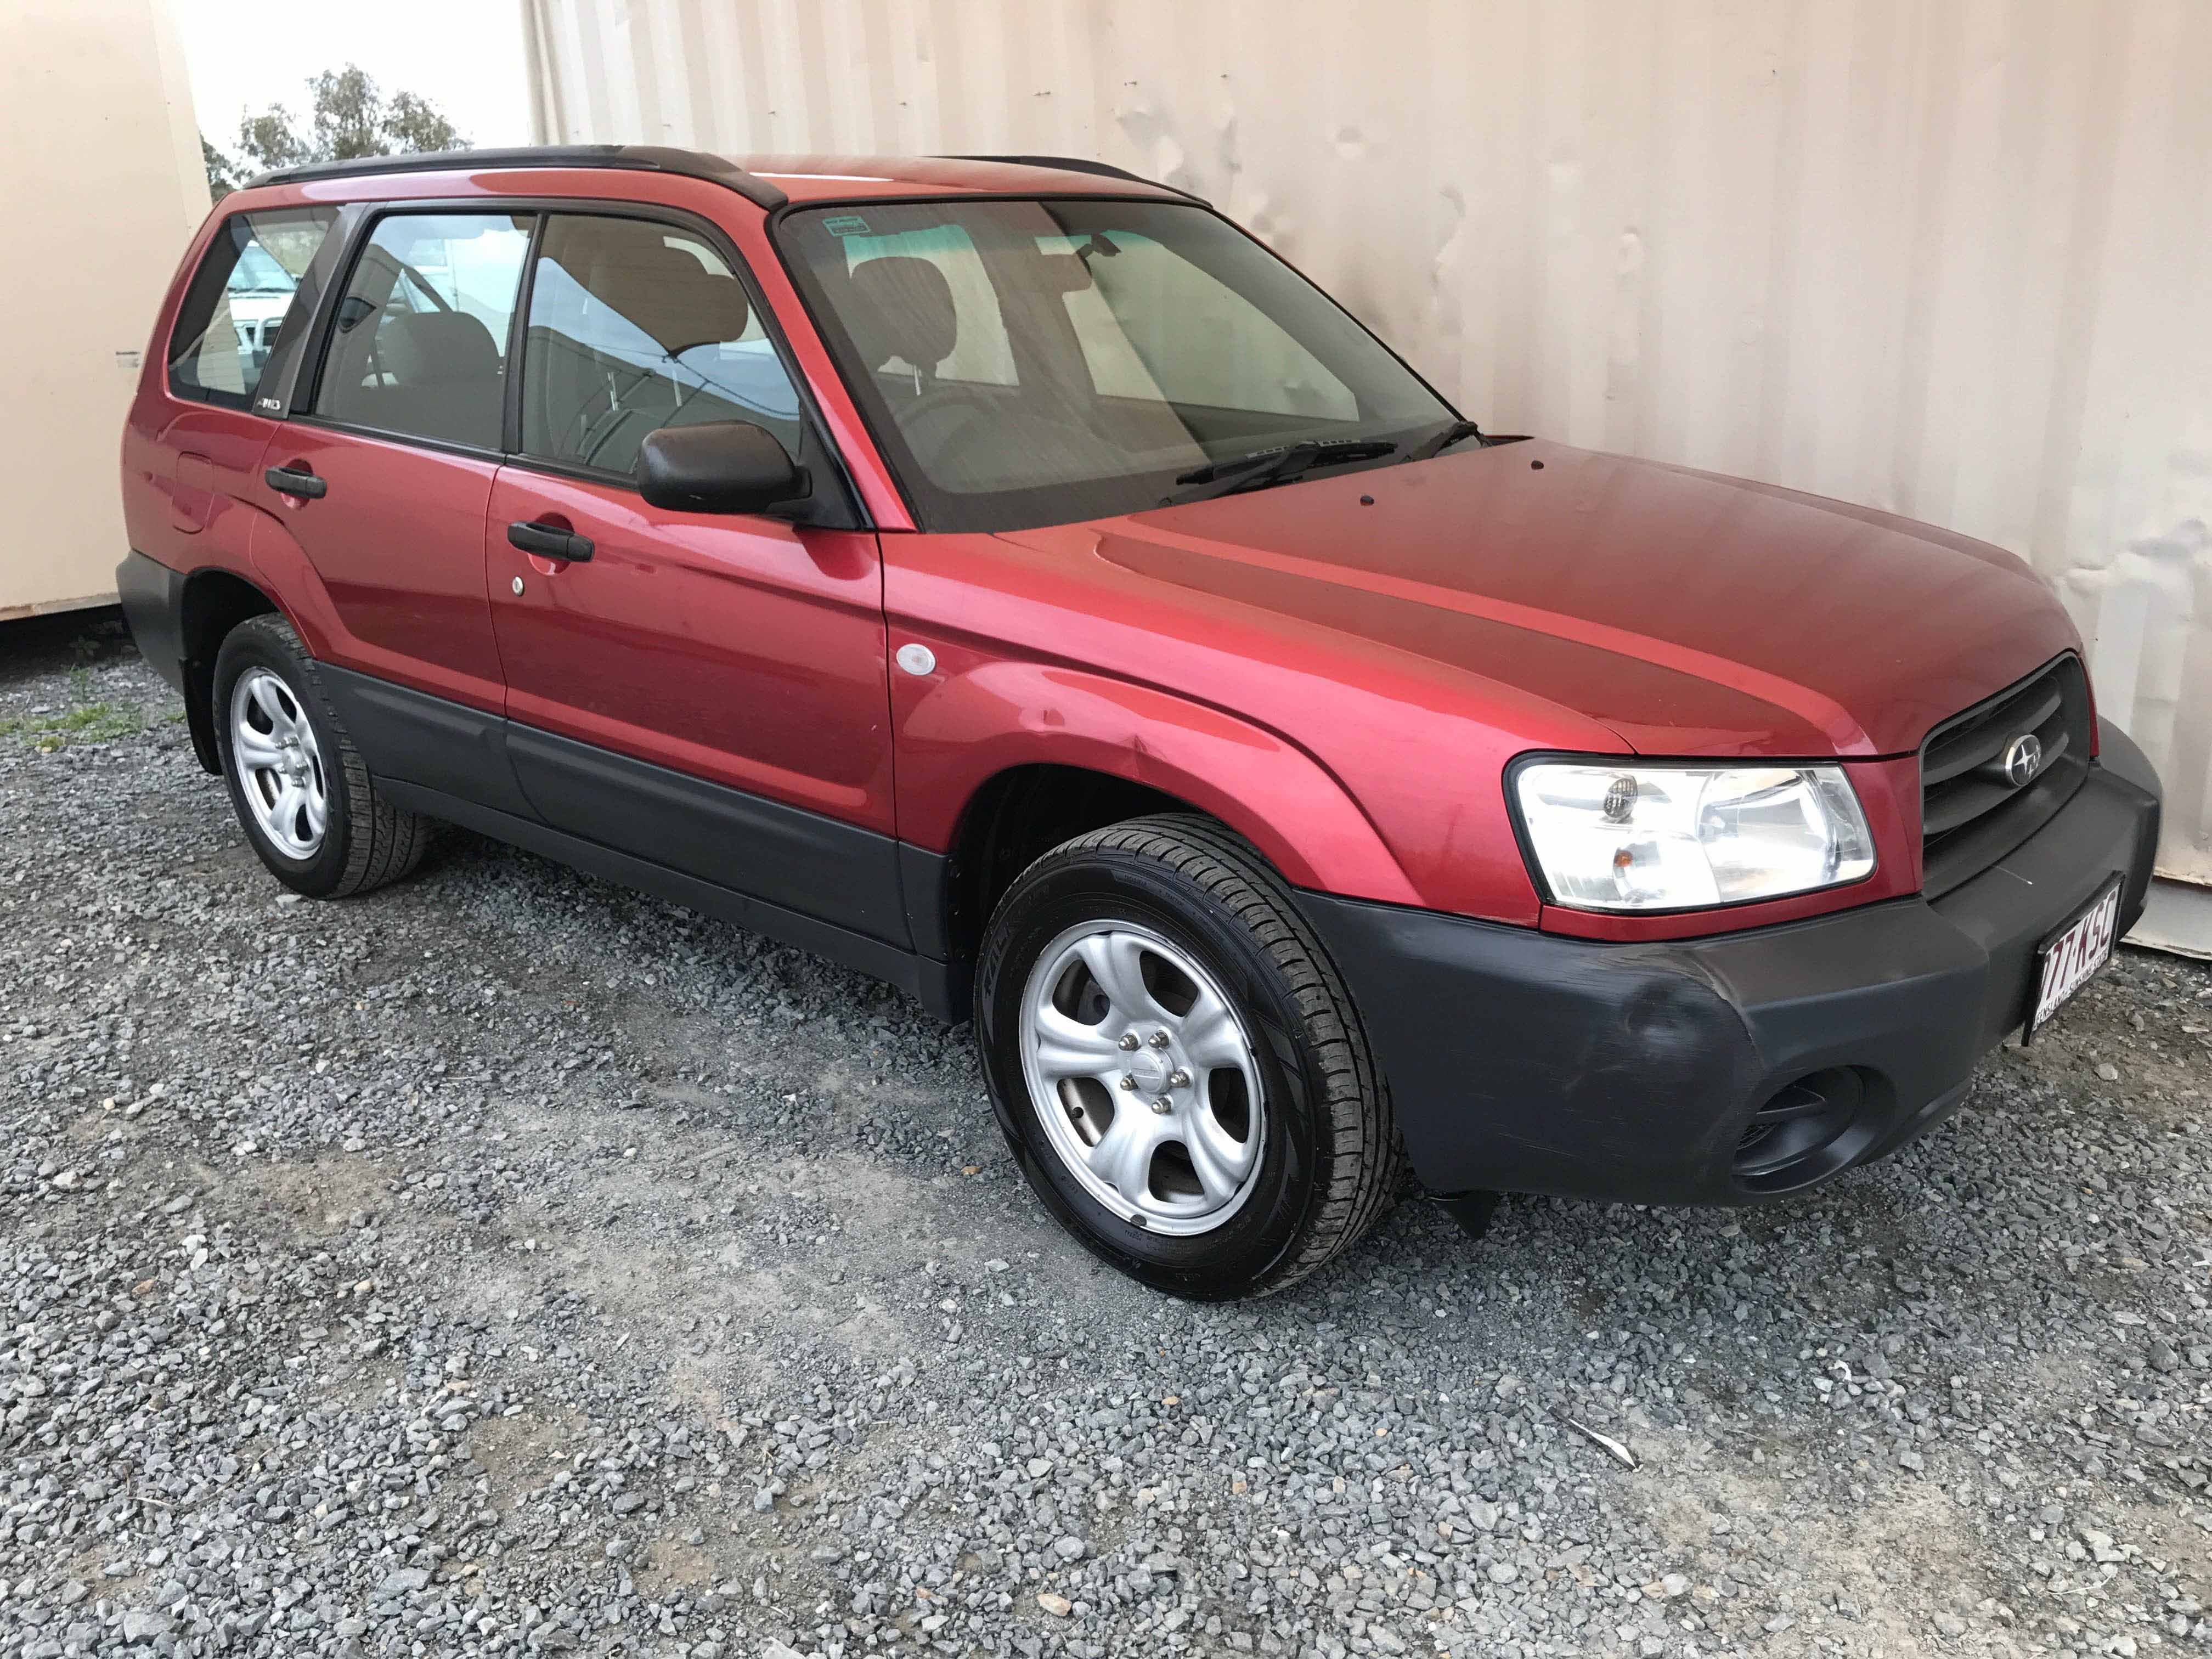 4cyl Awd Wagon Subaru Forester 2 5 X 2003 Red Used Vehicle Sales Subaru Subaru Forester Cars For Sale